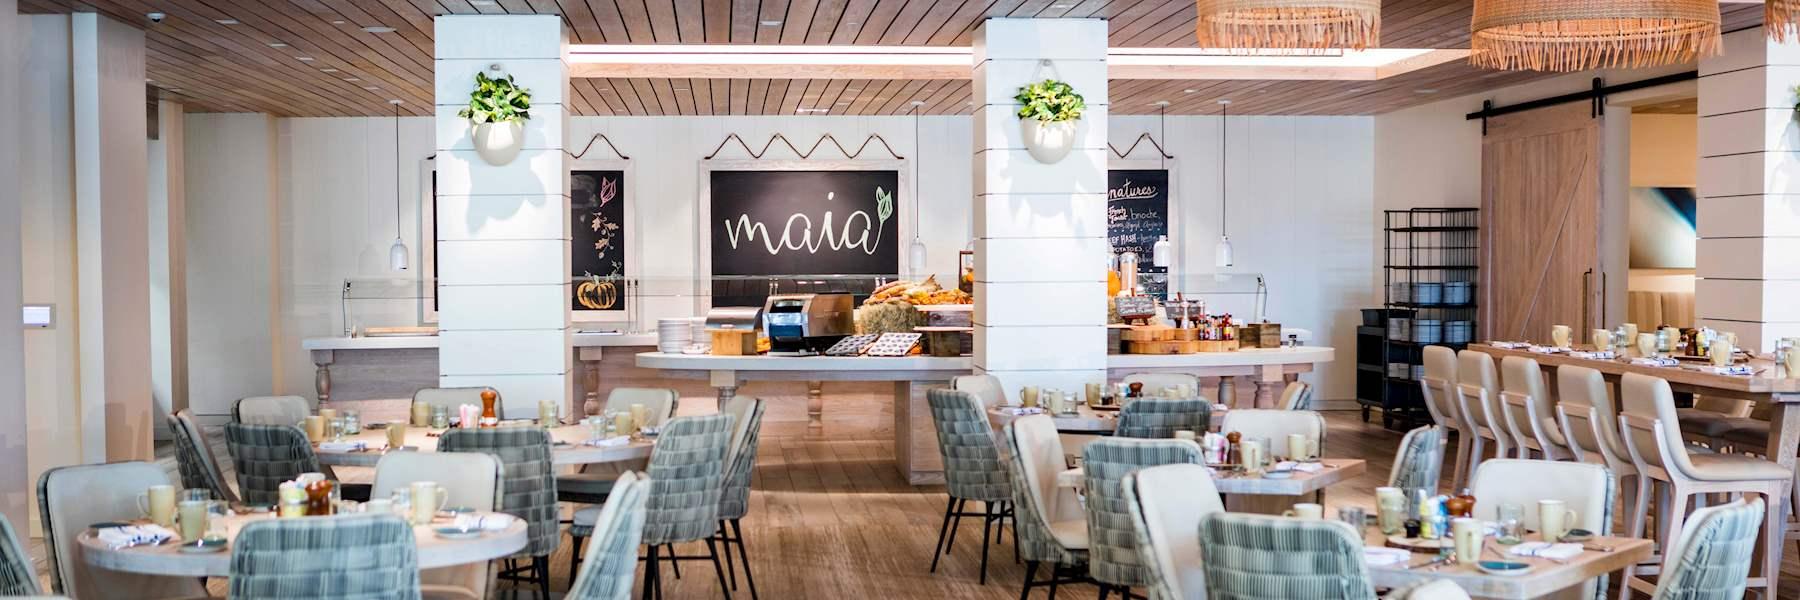 Home | JW Marriott Marco Island Beach Resort